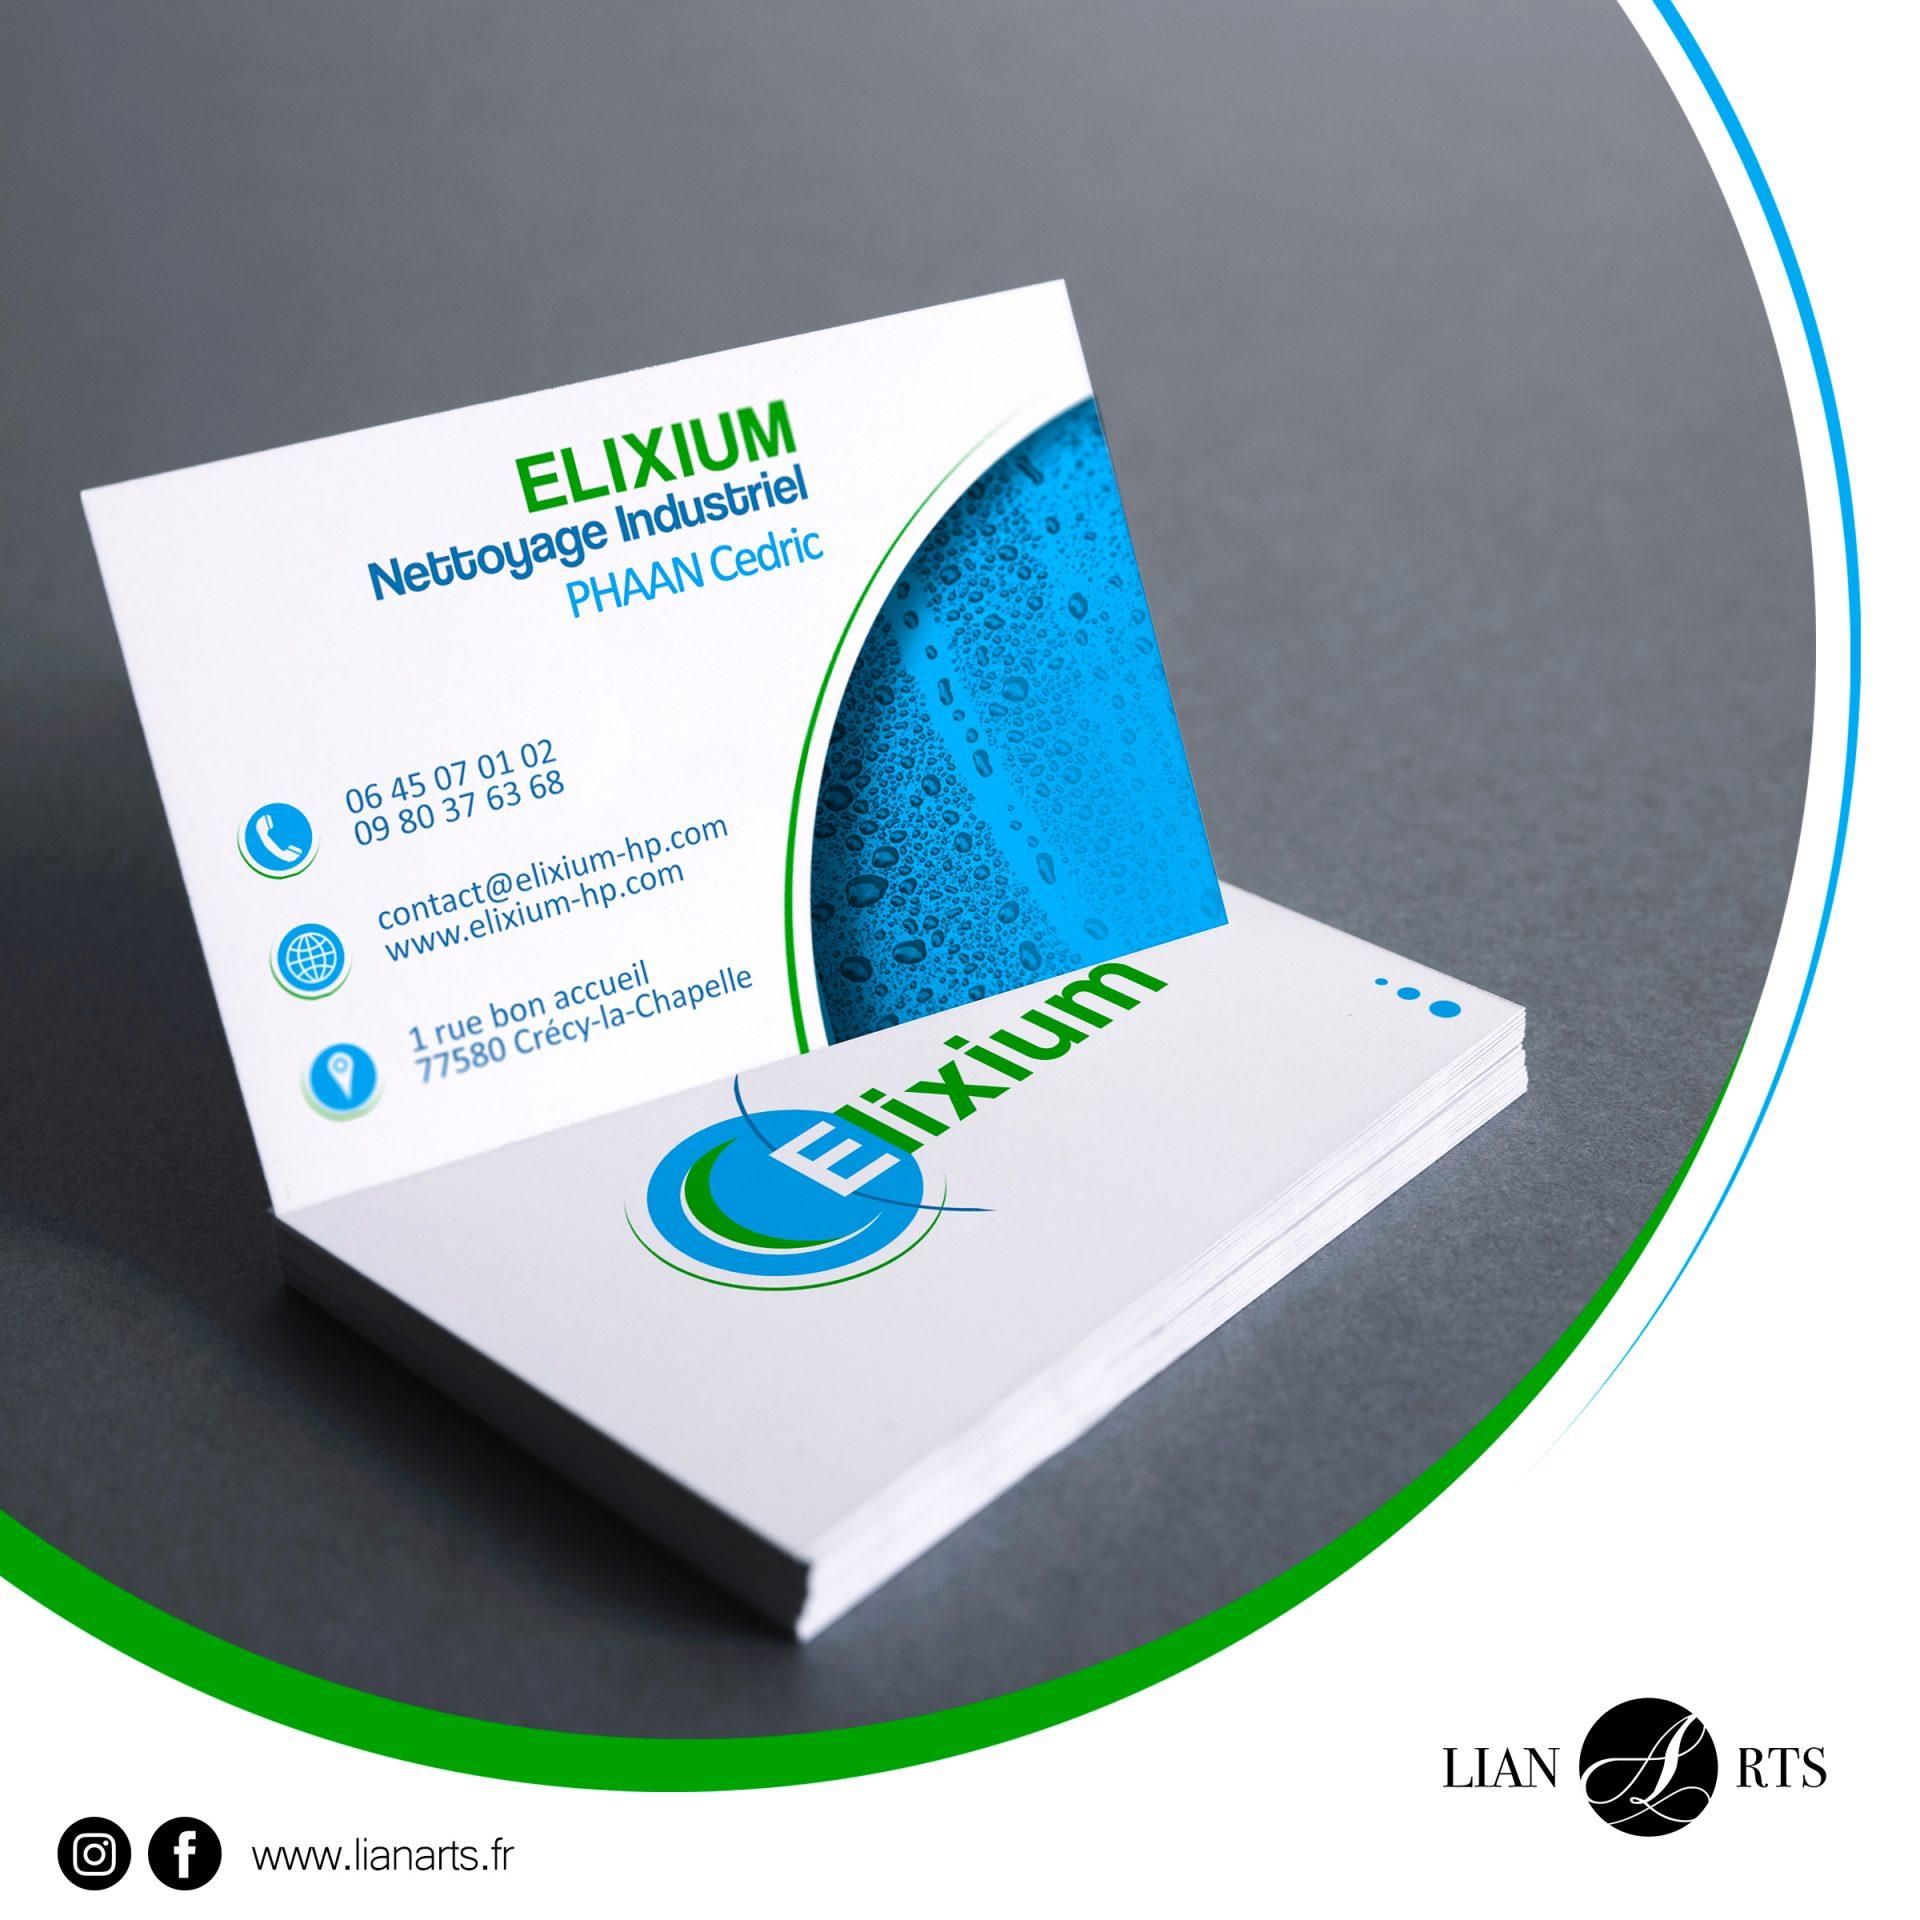 Projet - Elixium - Création LianArts